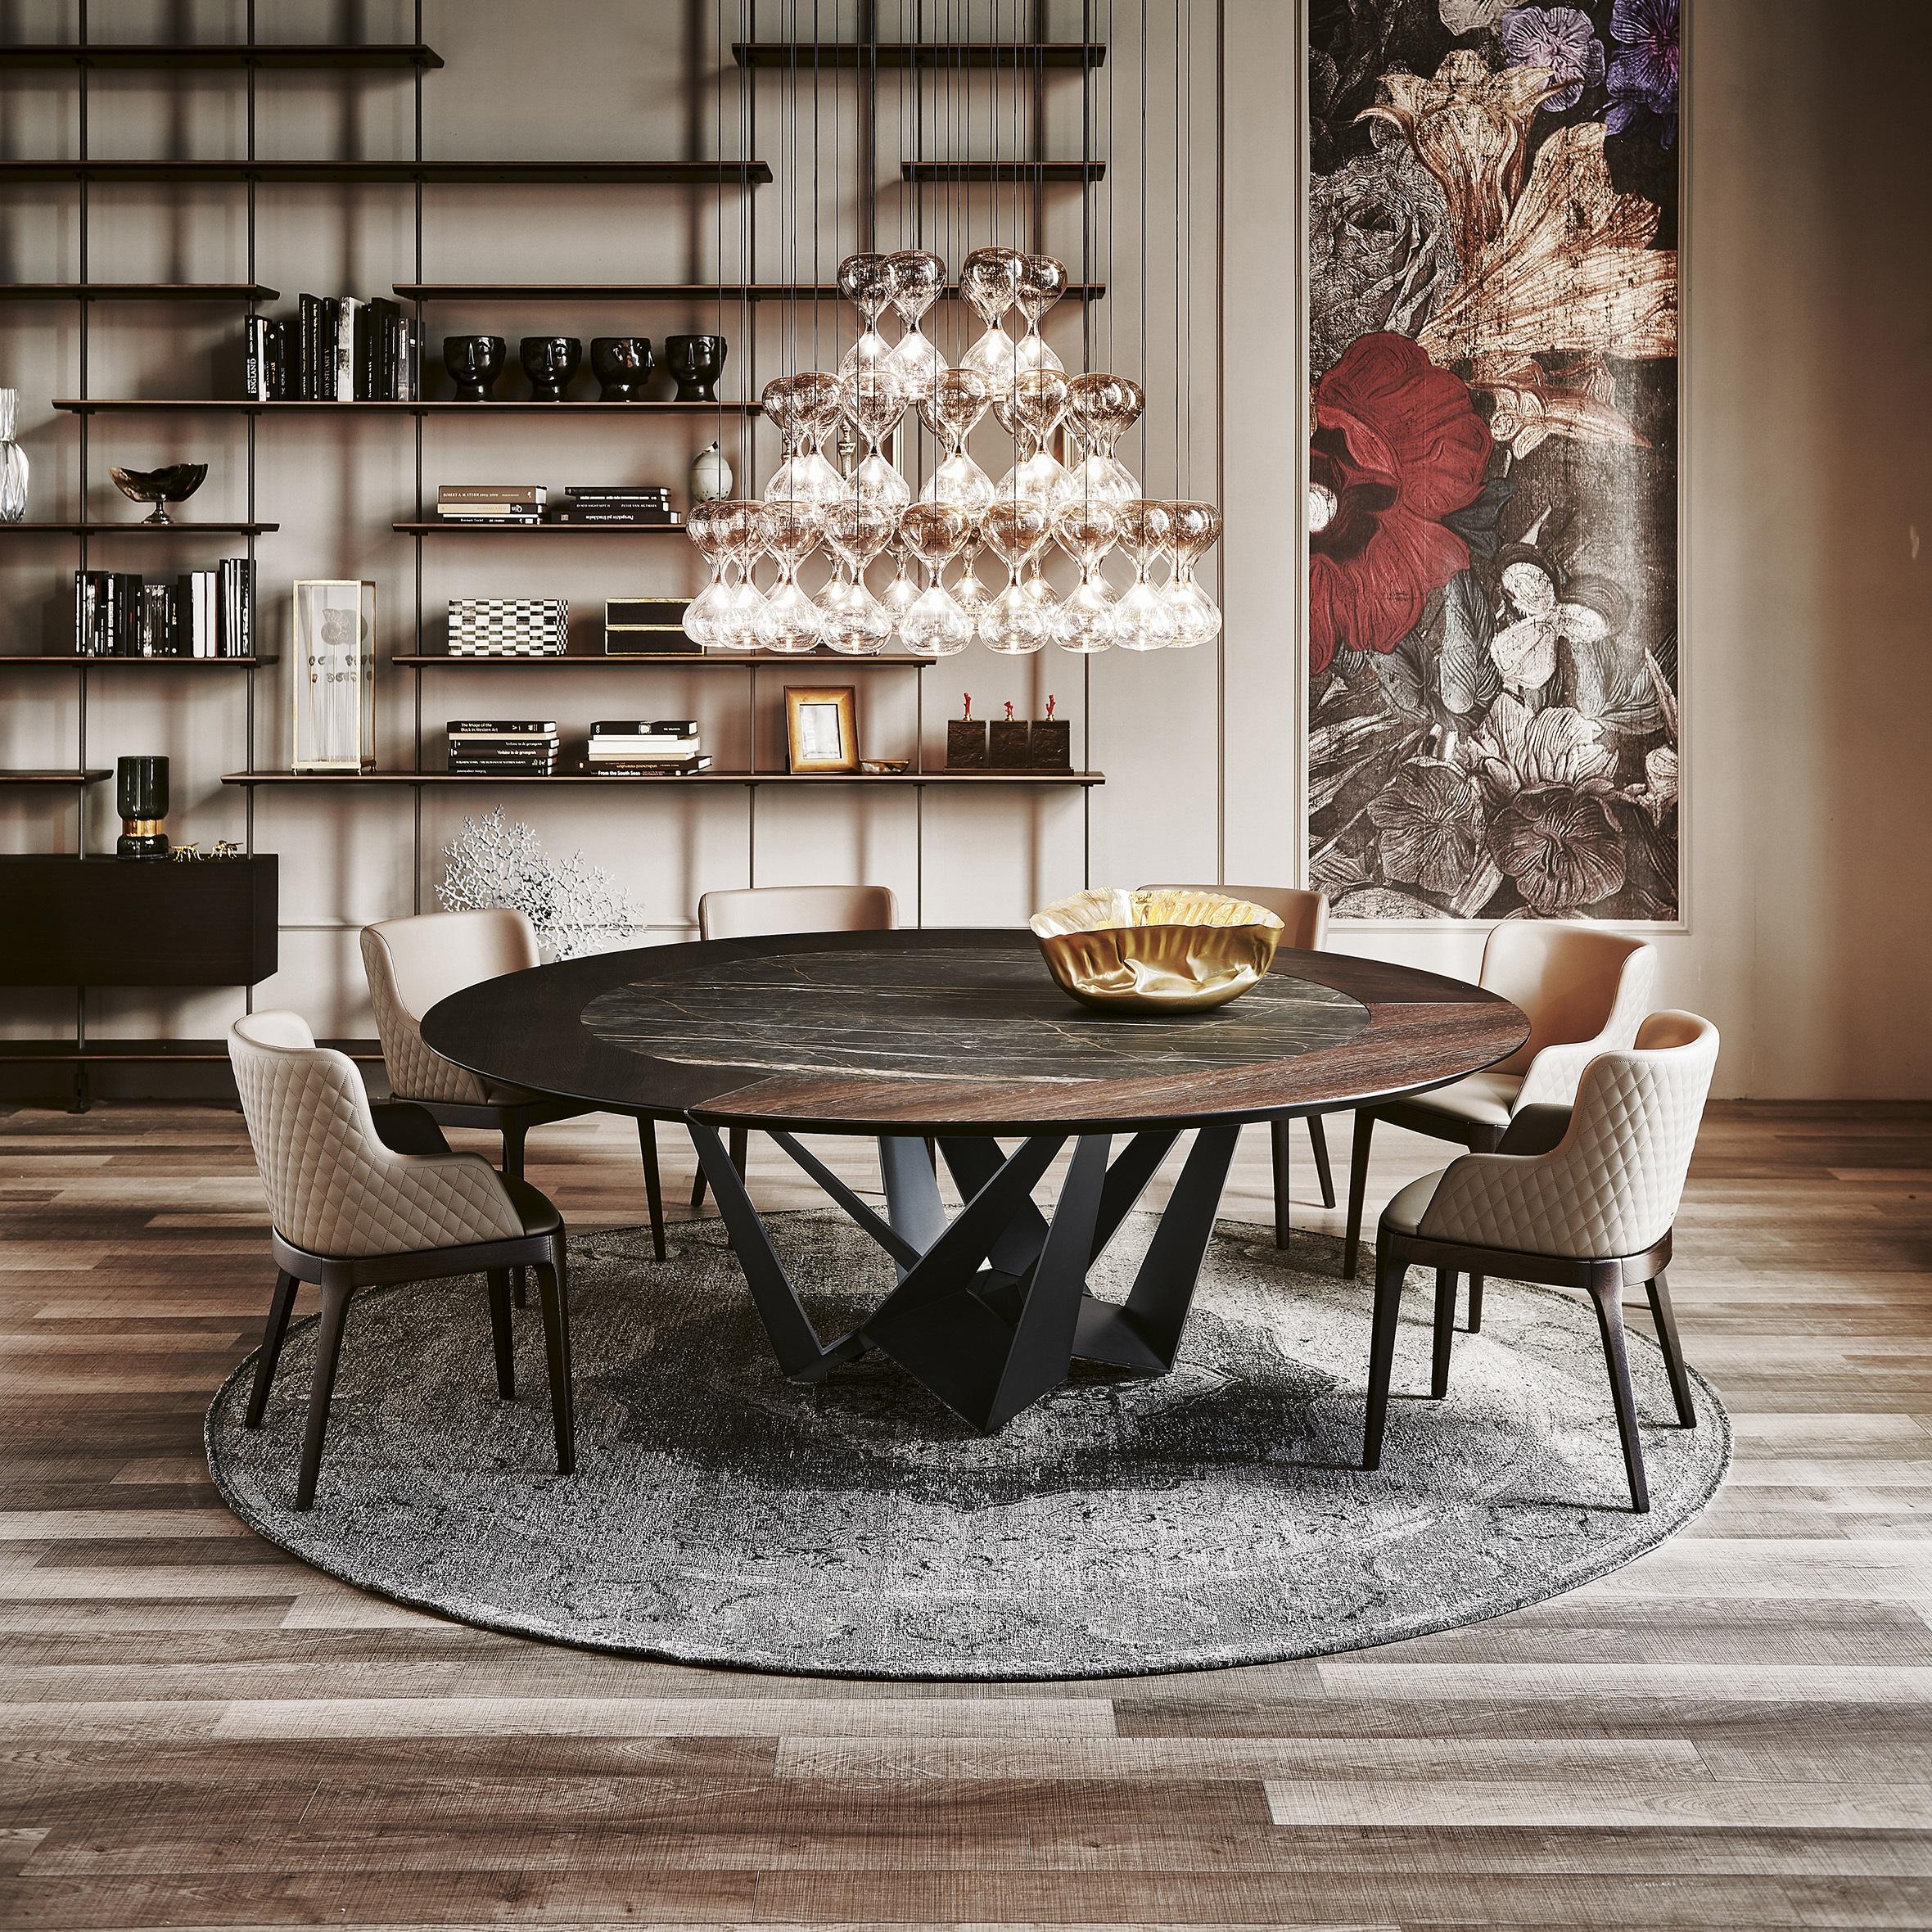 The Skorpio Ker-wood dining table